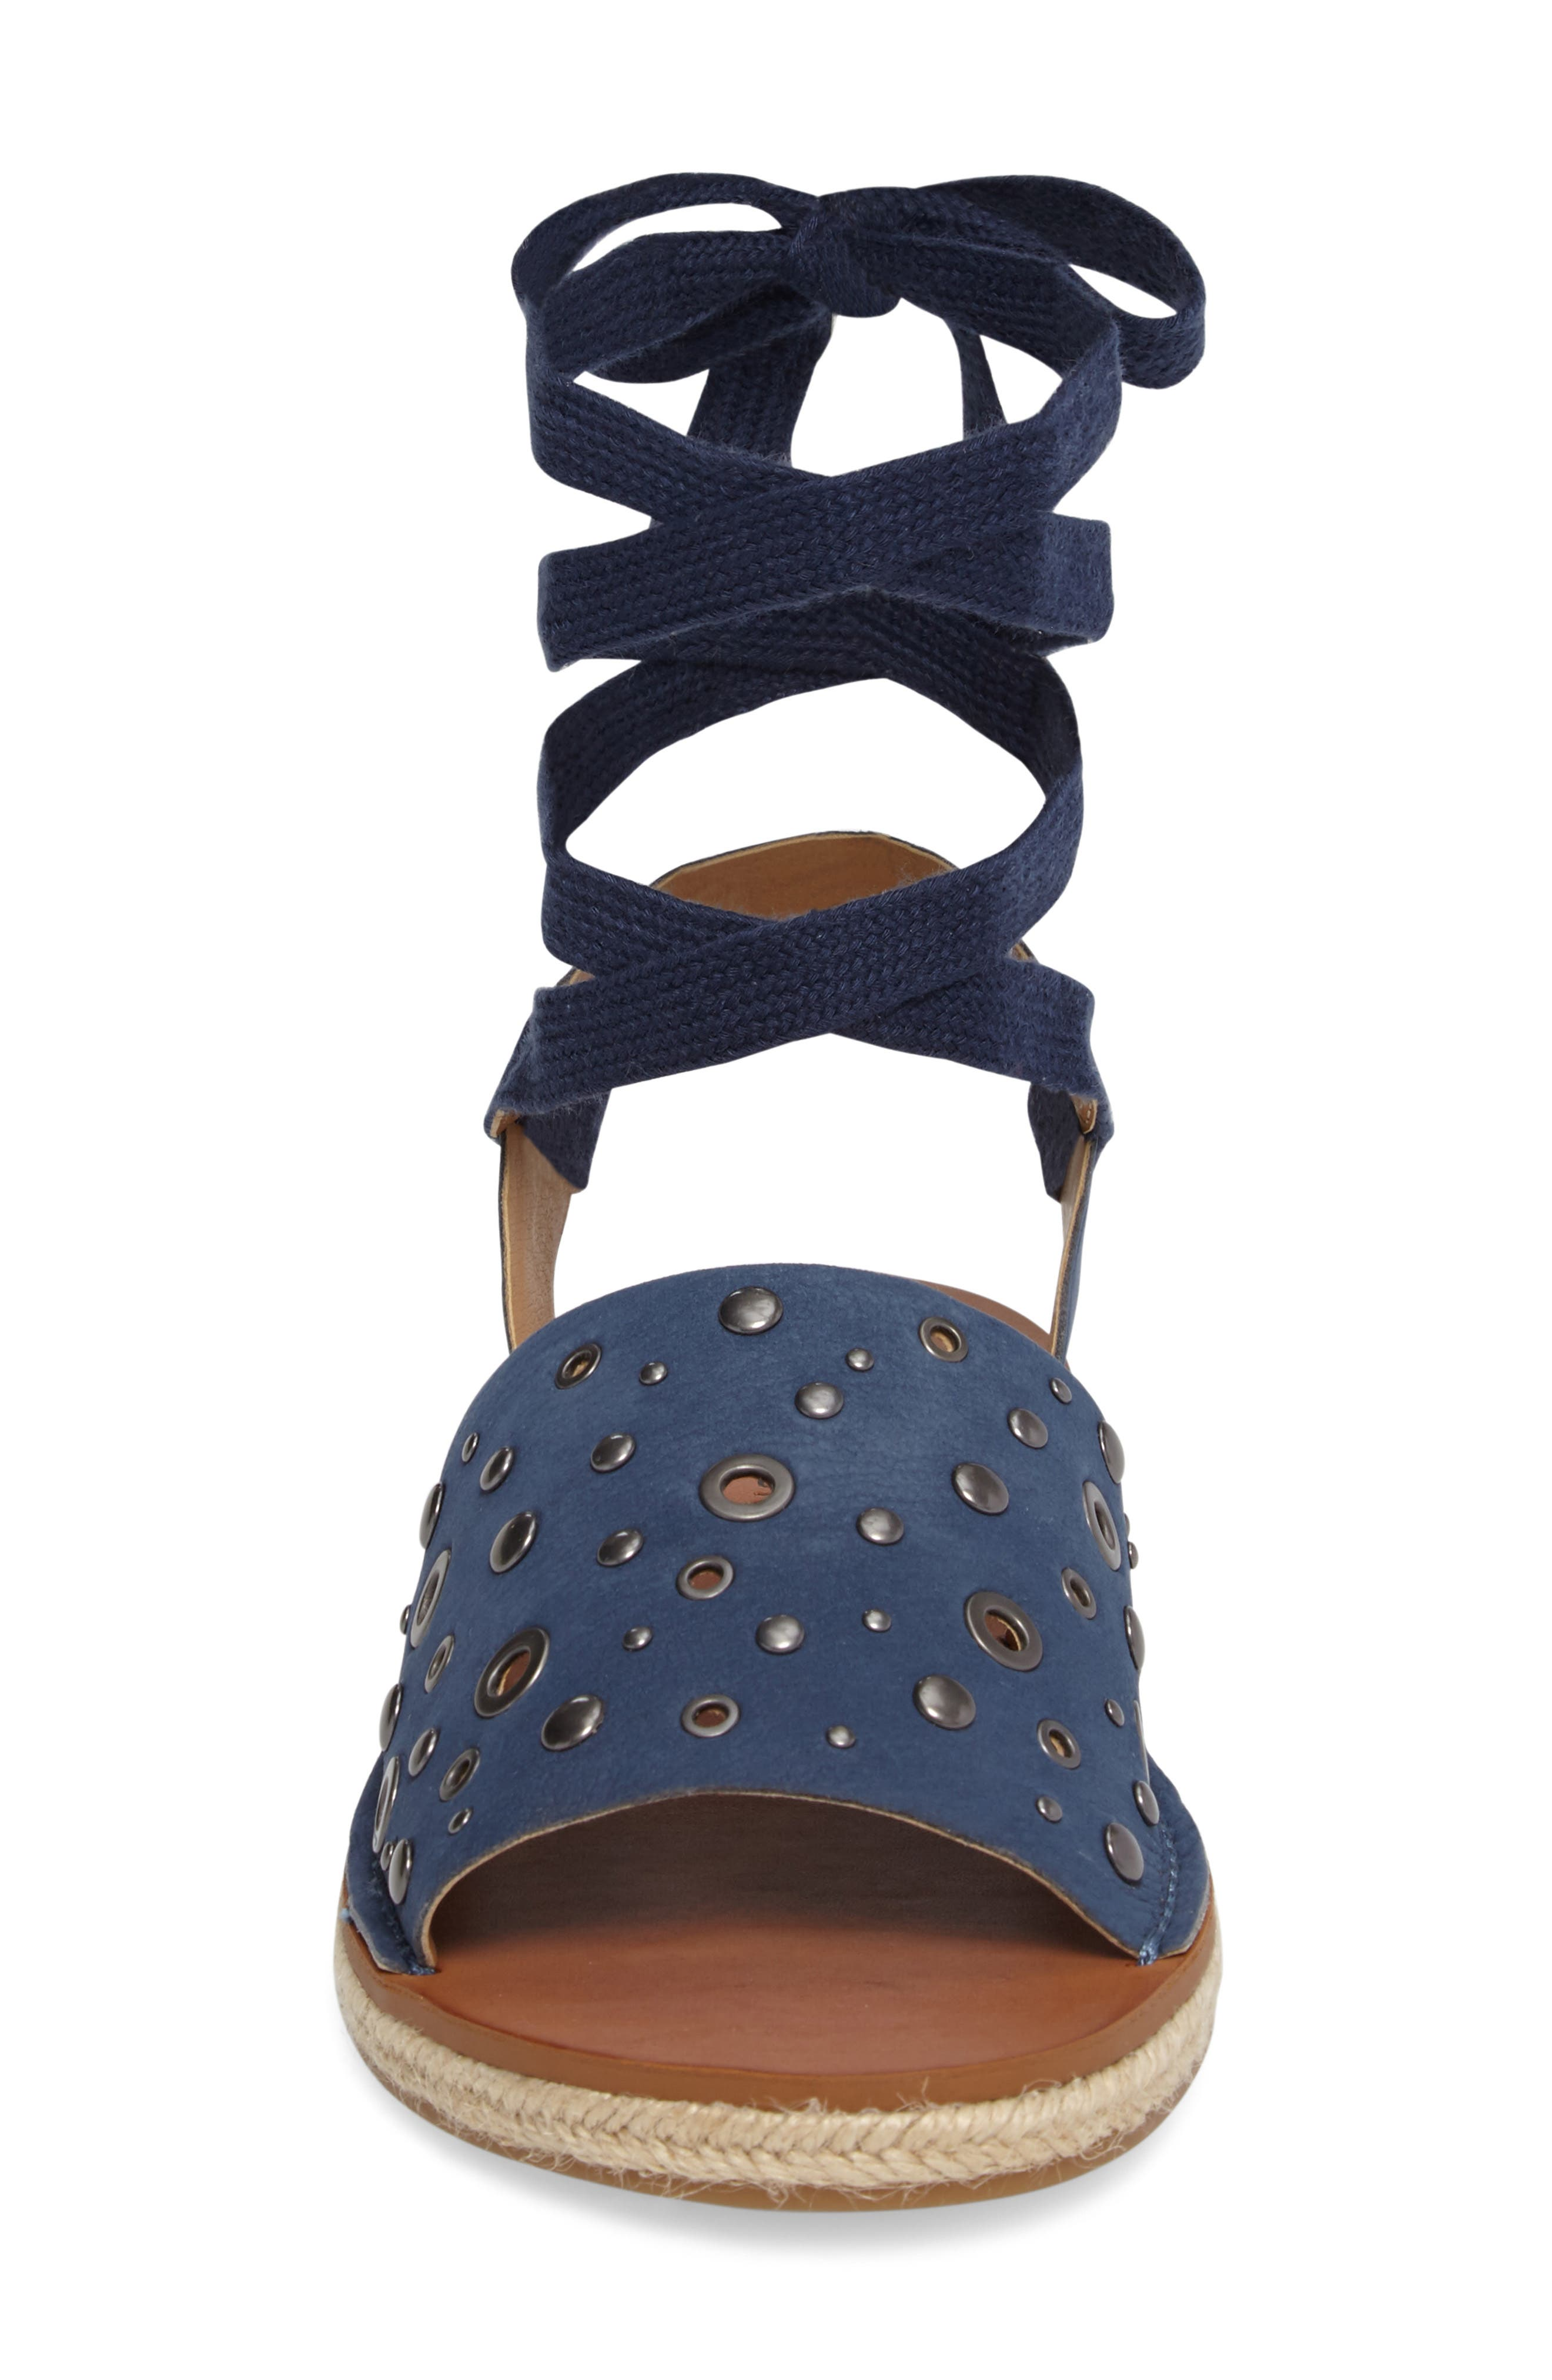 Daytah Ankle Tie Sandal,                             Alternate thumbnail 4, color,                             Dark Chambray